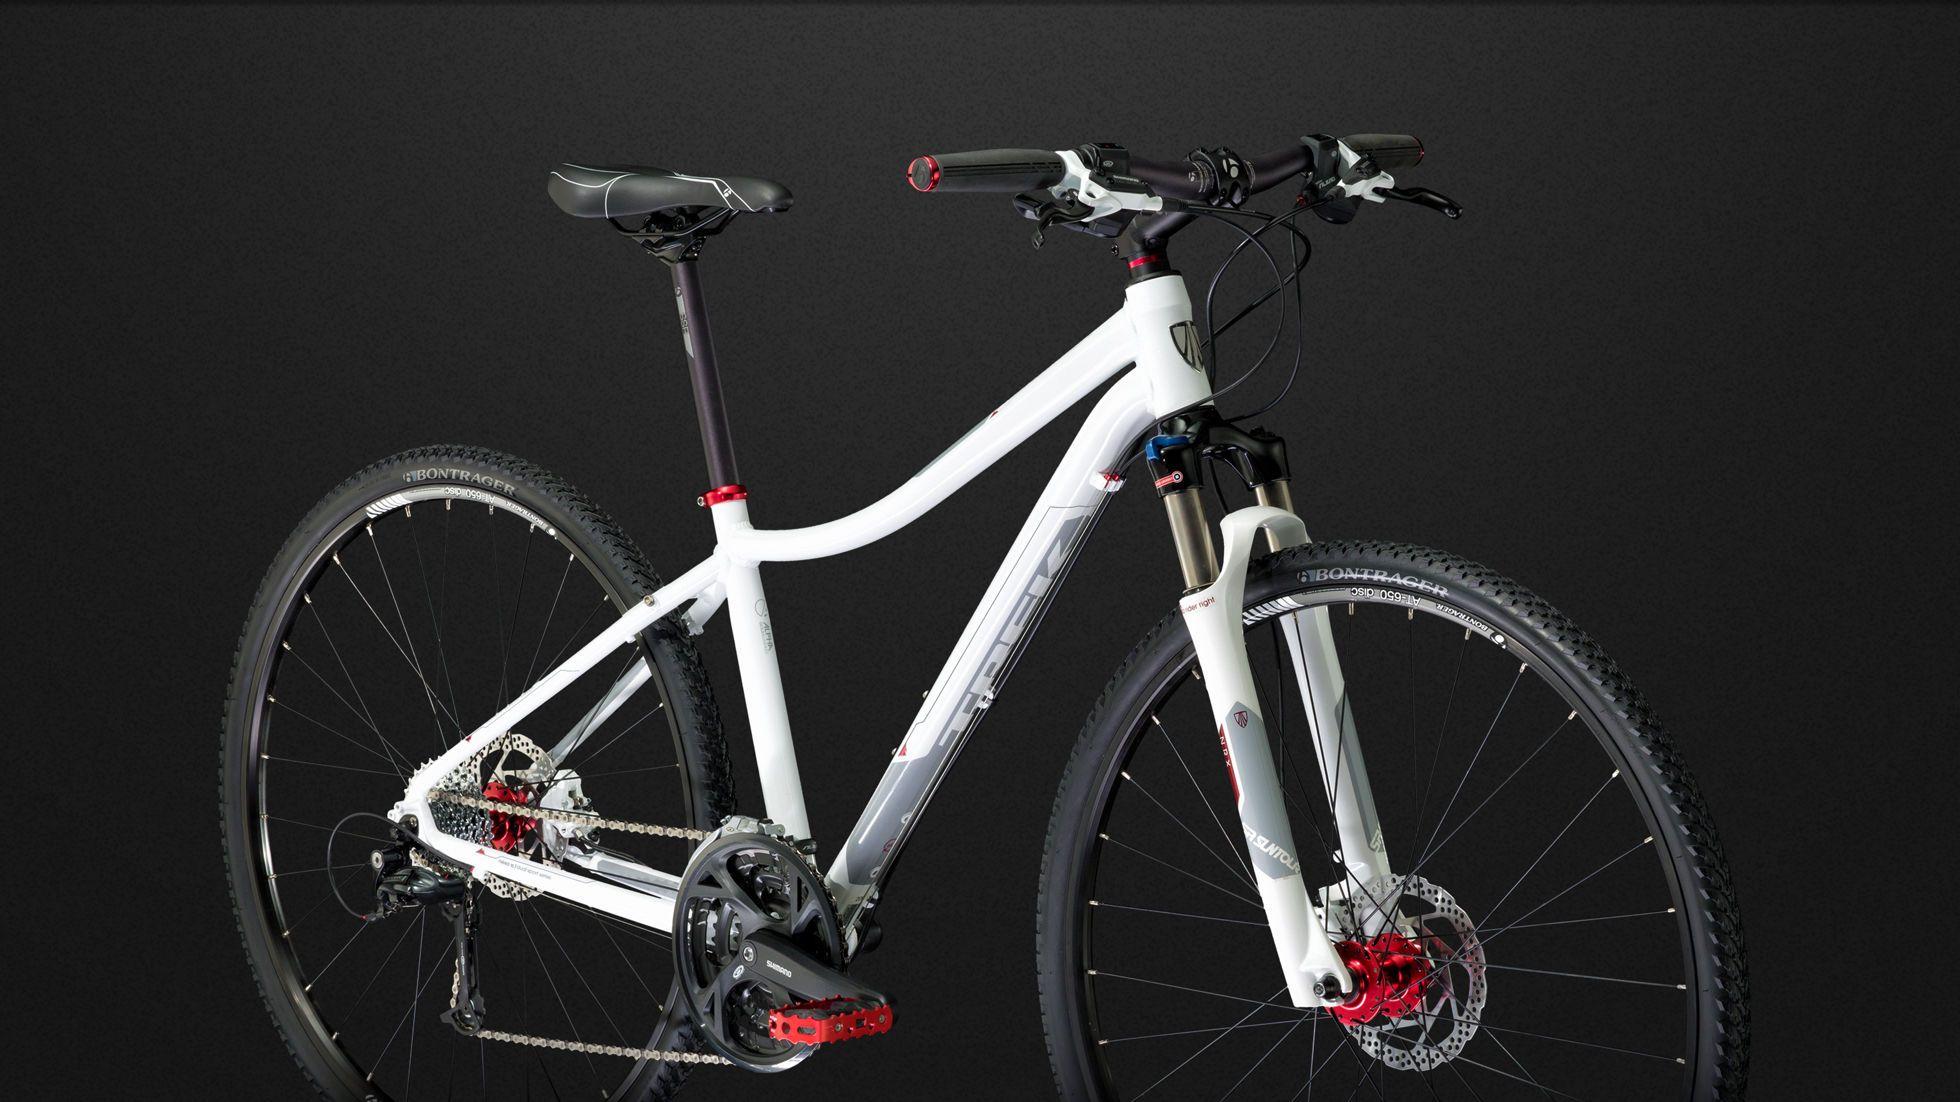 Gary Fisher Dual Woman's Trek bikes, Bicycle